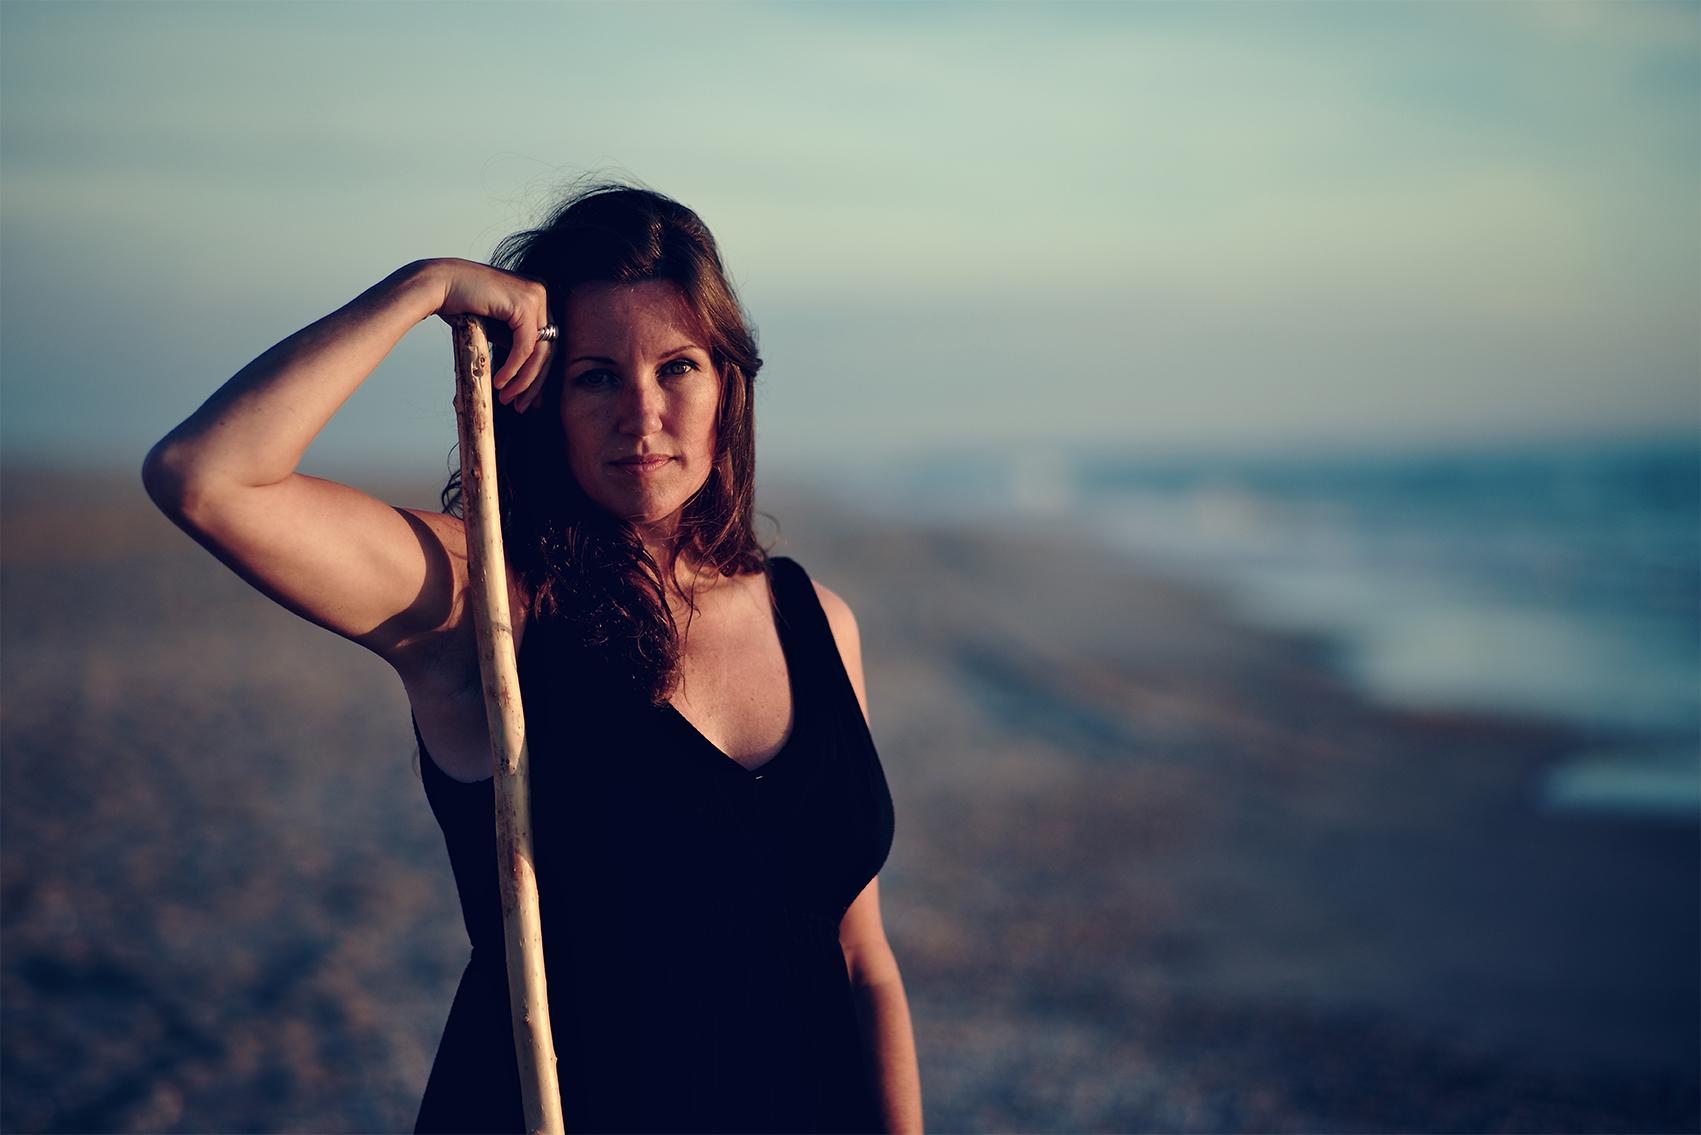 Helen Botman - I Sing (foto: Saskia Kerkhoff, Dutchlook)